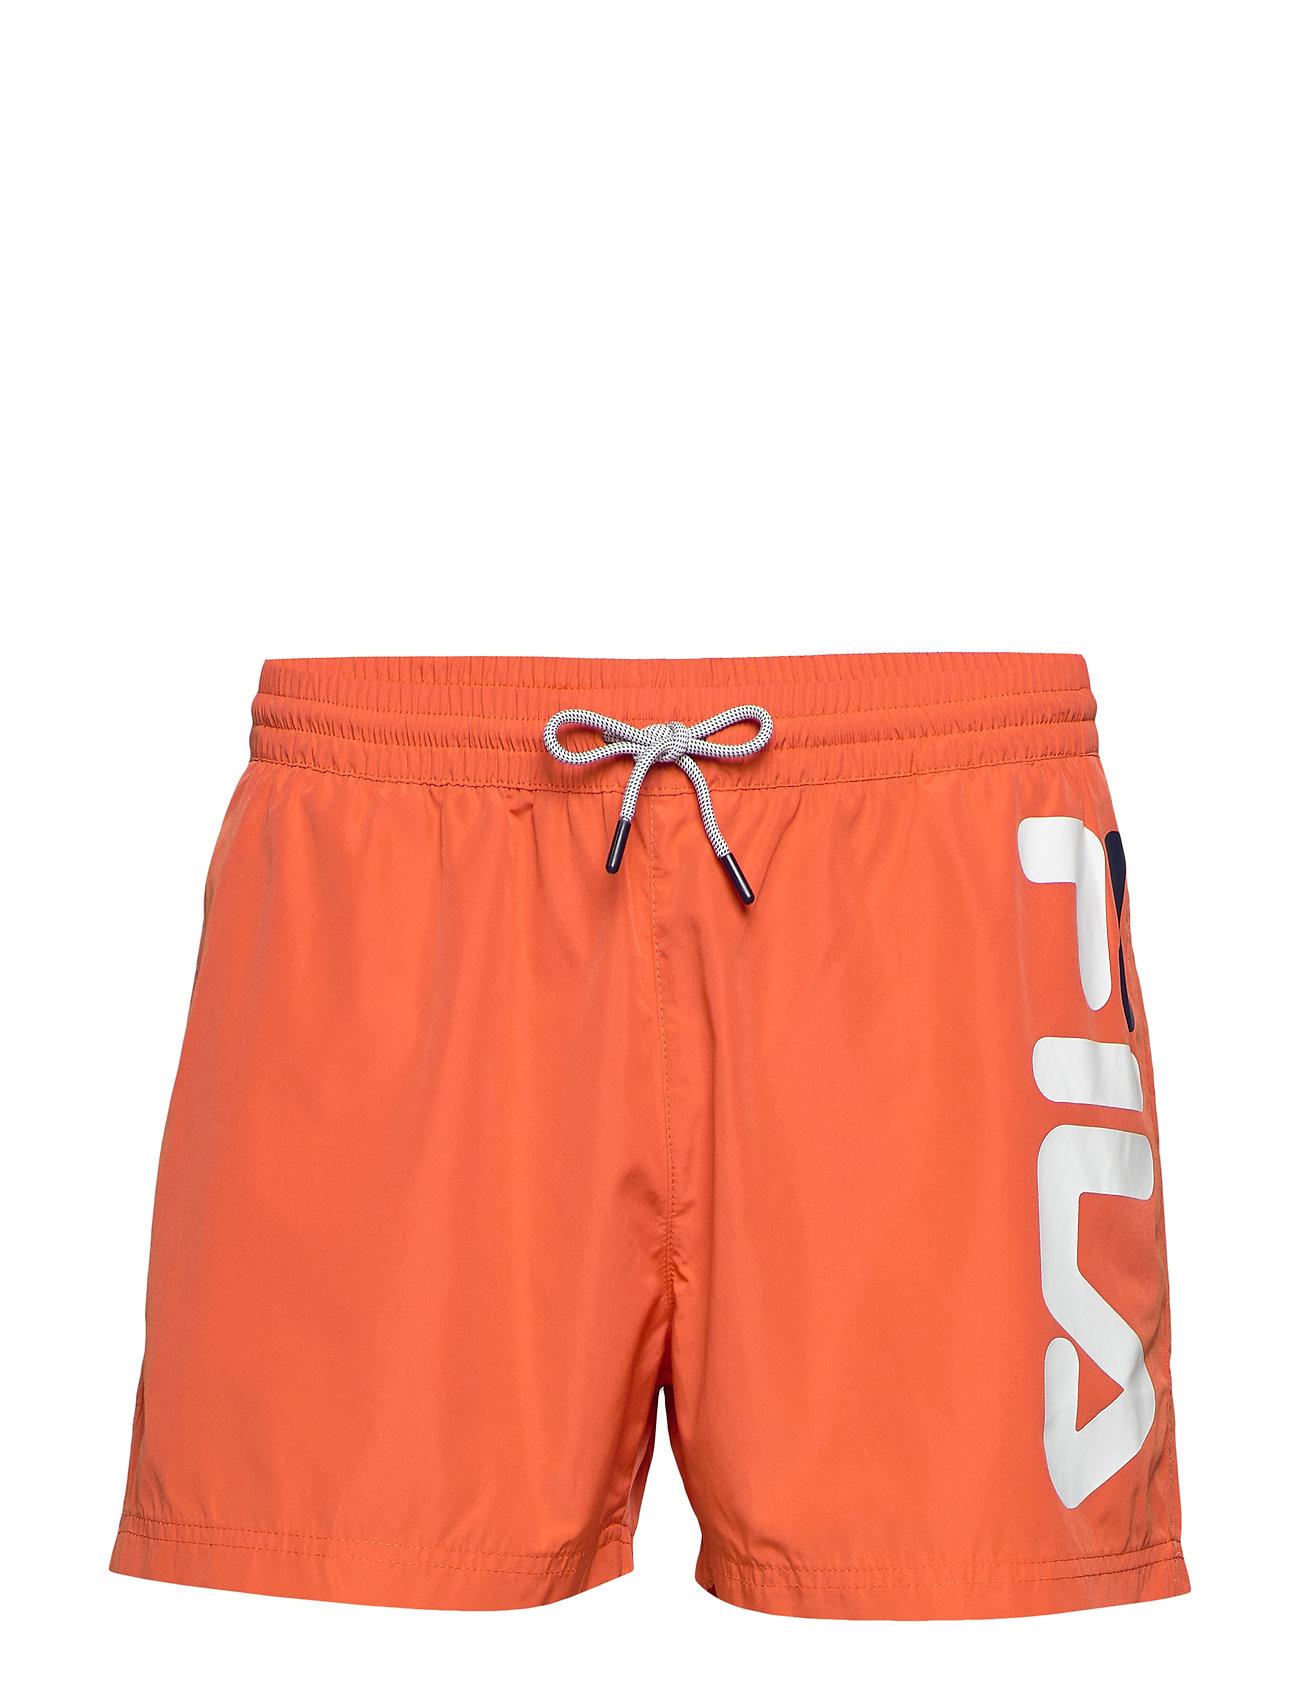 FILA MEN MICHI beach shorts - TIGERLILY